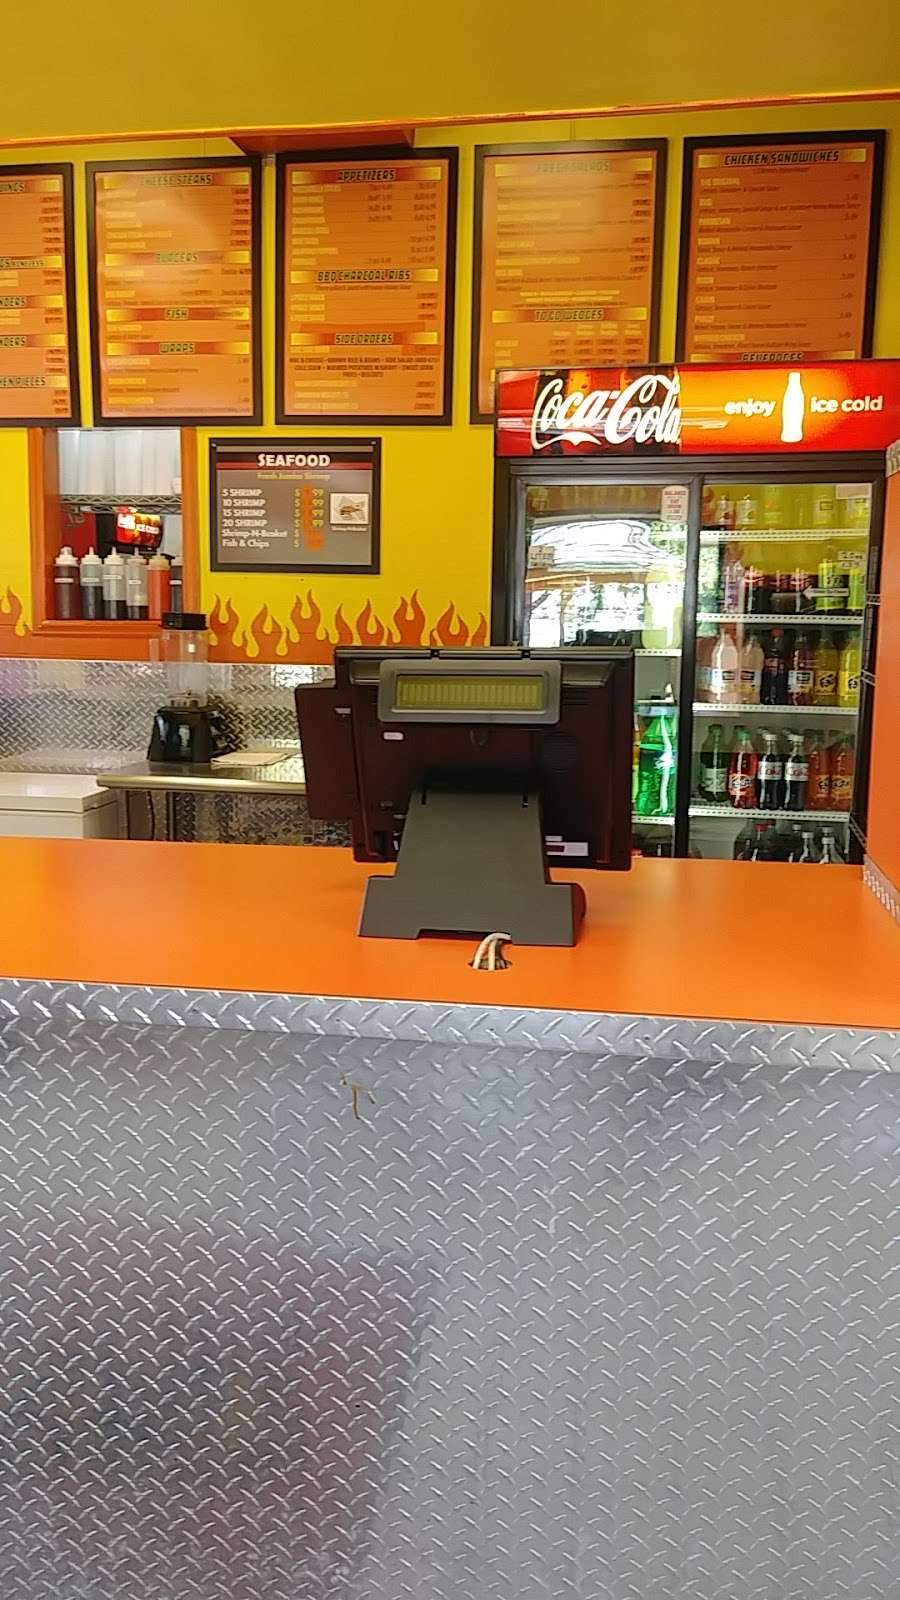 Chicken to Go - restaurant    Photo 8 of 10   Address: 1904 S Broad St, Trenton, NJ 08610, USA   Phone: (609) 989-1414